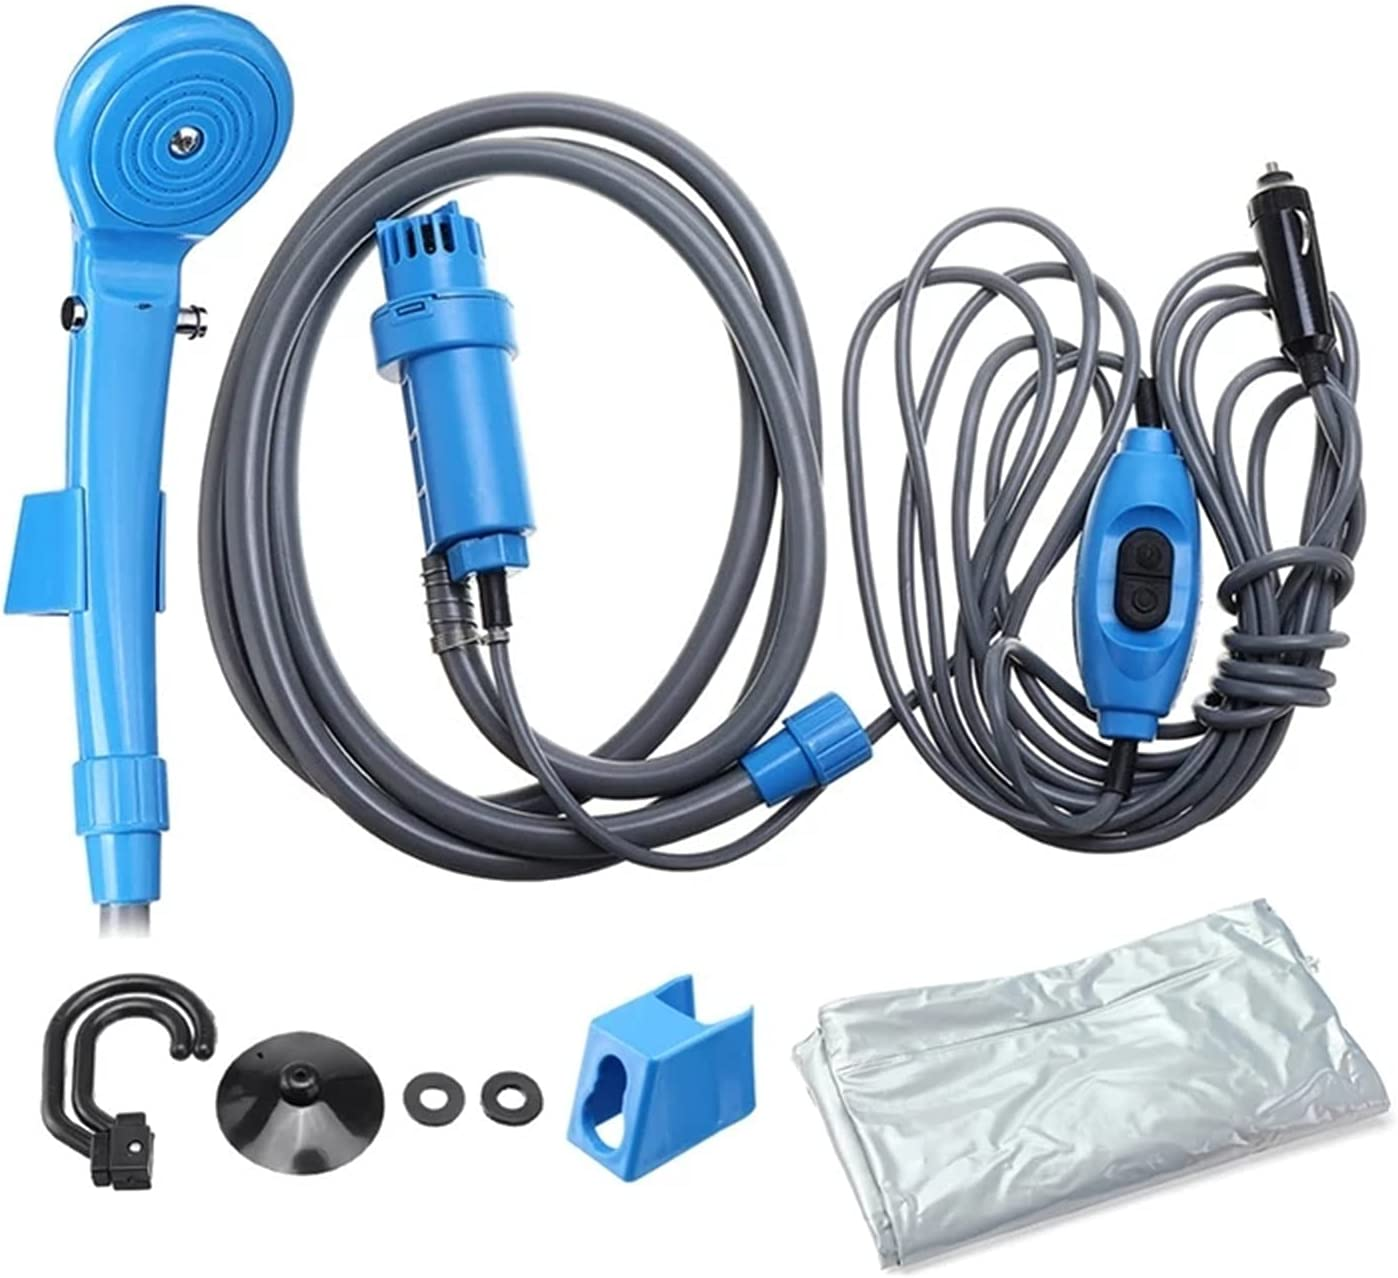 PQW 12V Car Cigarette Lighter Pump Mesa Mall Shower quality assurance Electric Head Portable